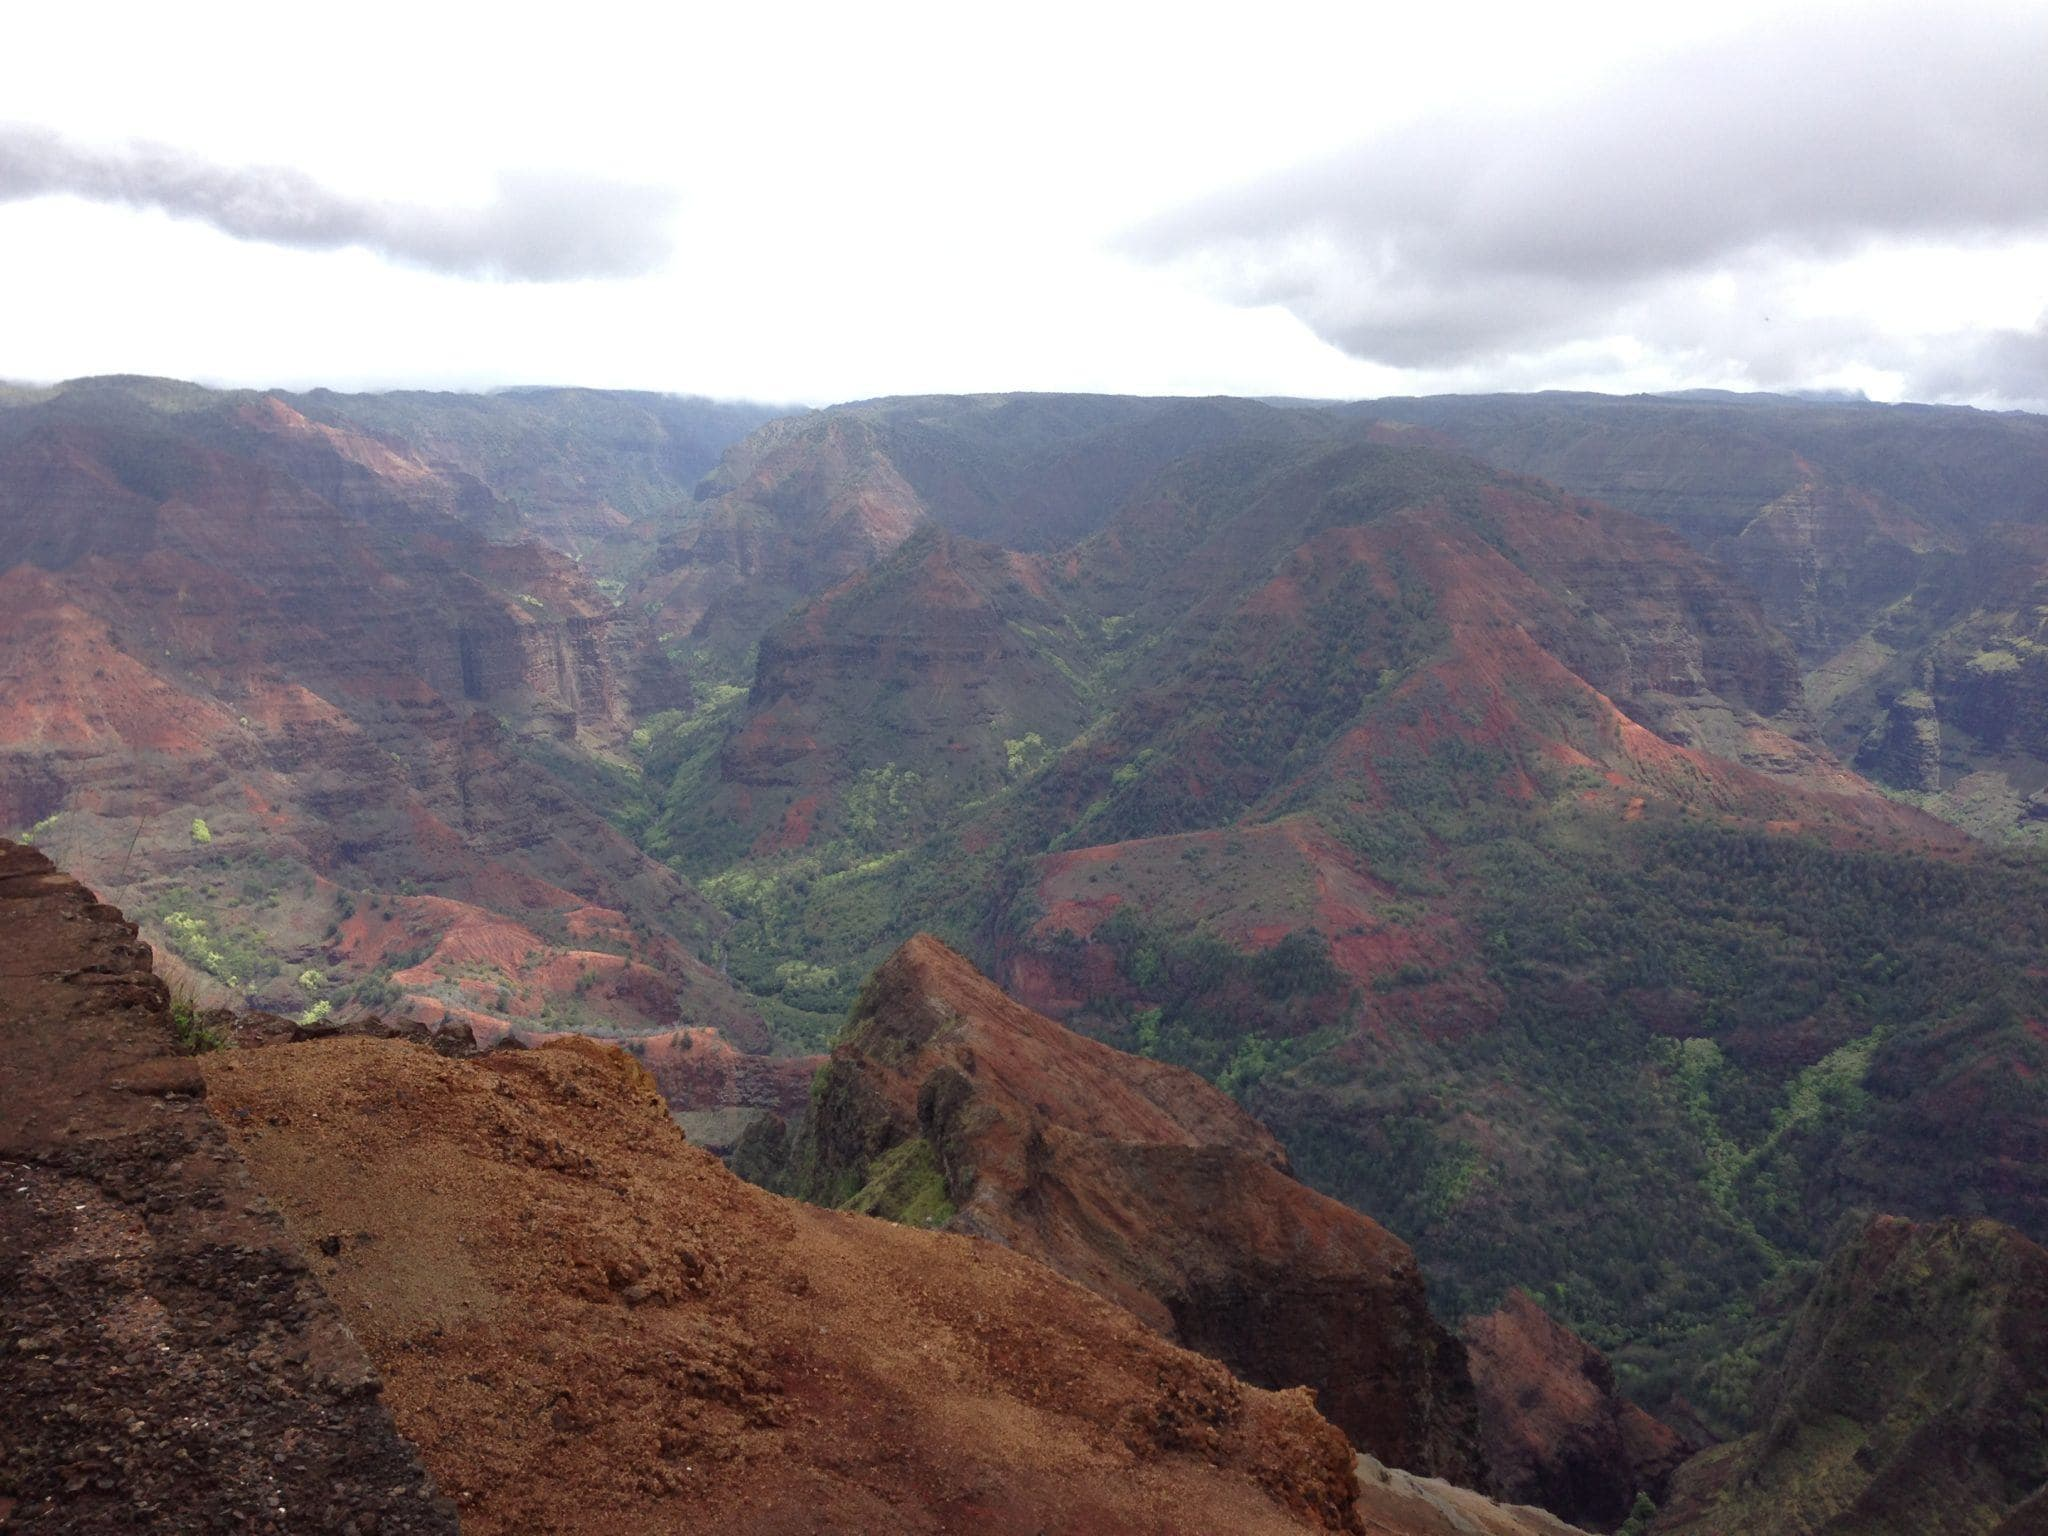 Waimea Canyon, The Grand Canyon of the Pacific